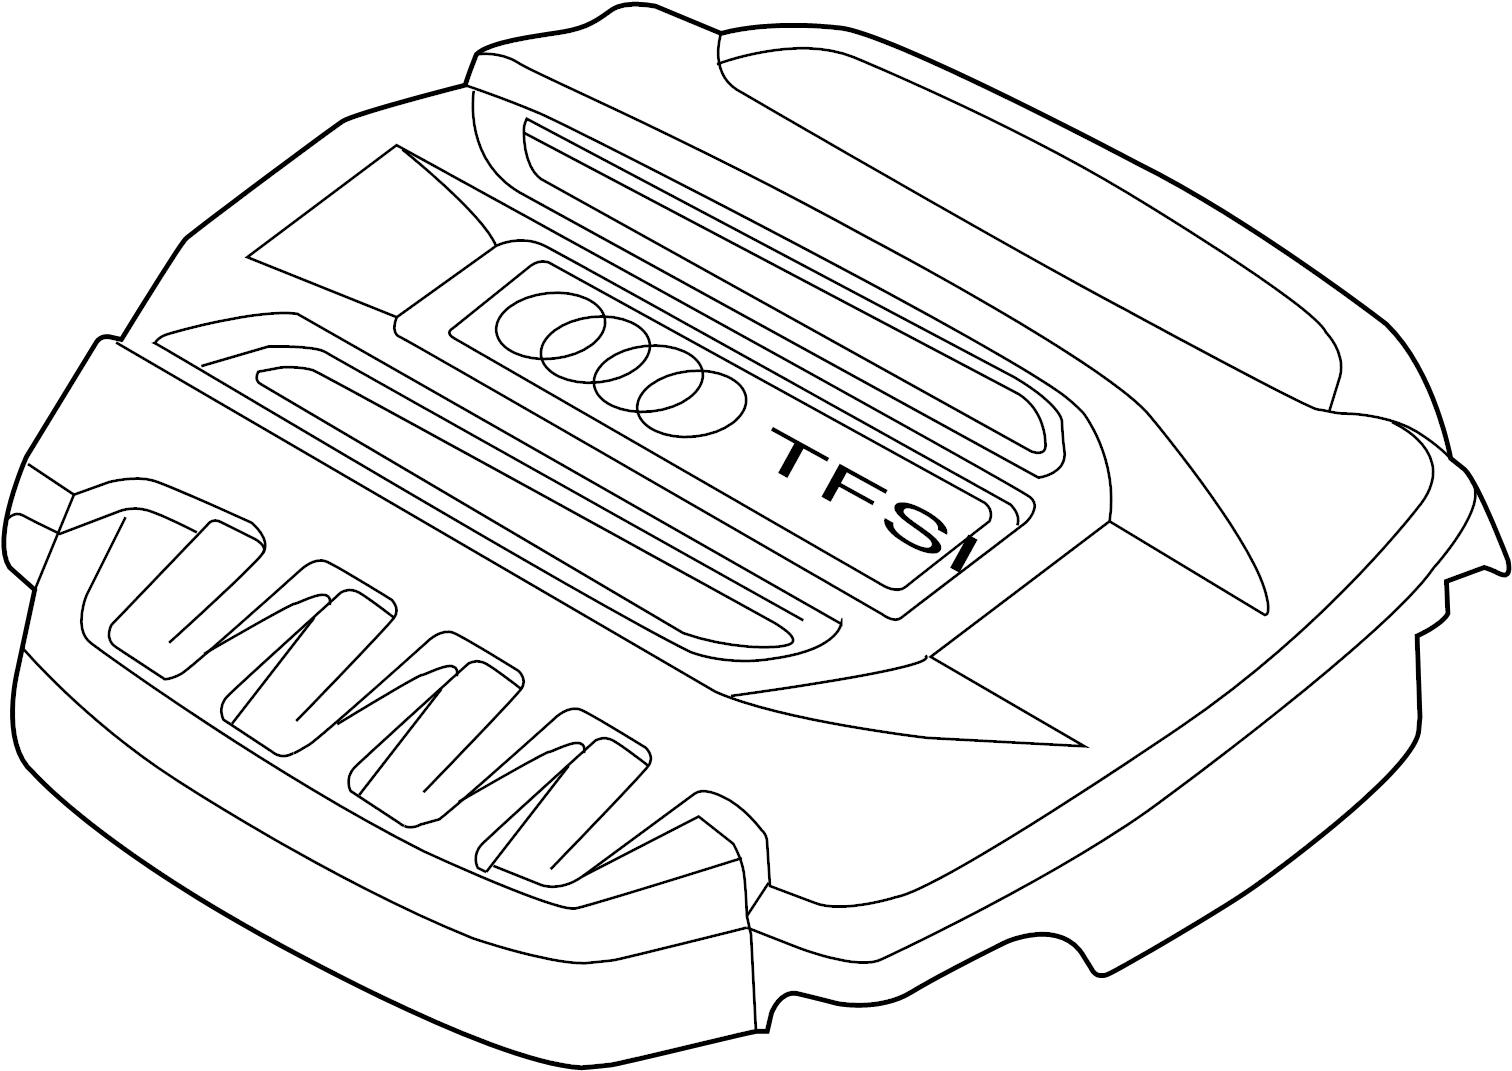 Audi Tt Engine Cover Liter Convertible Transaxle